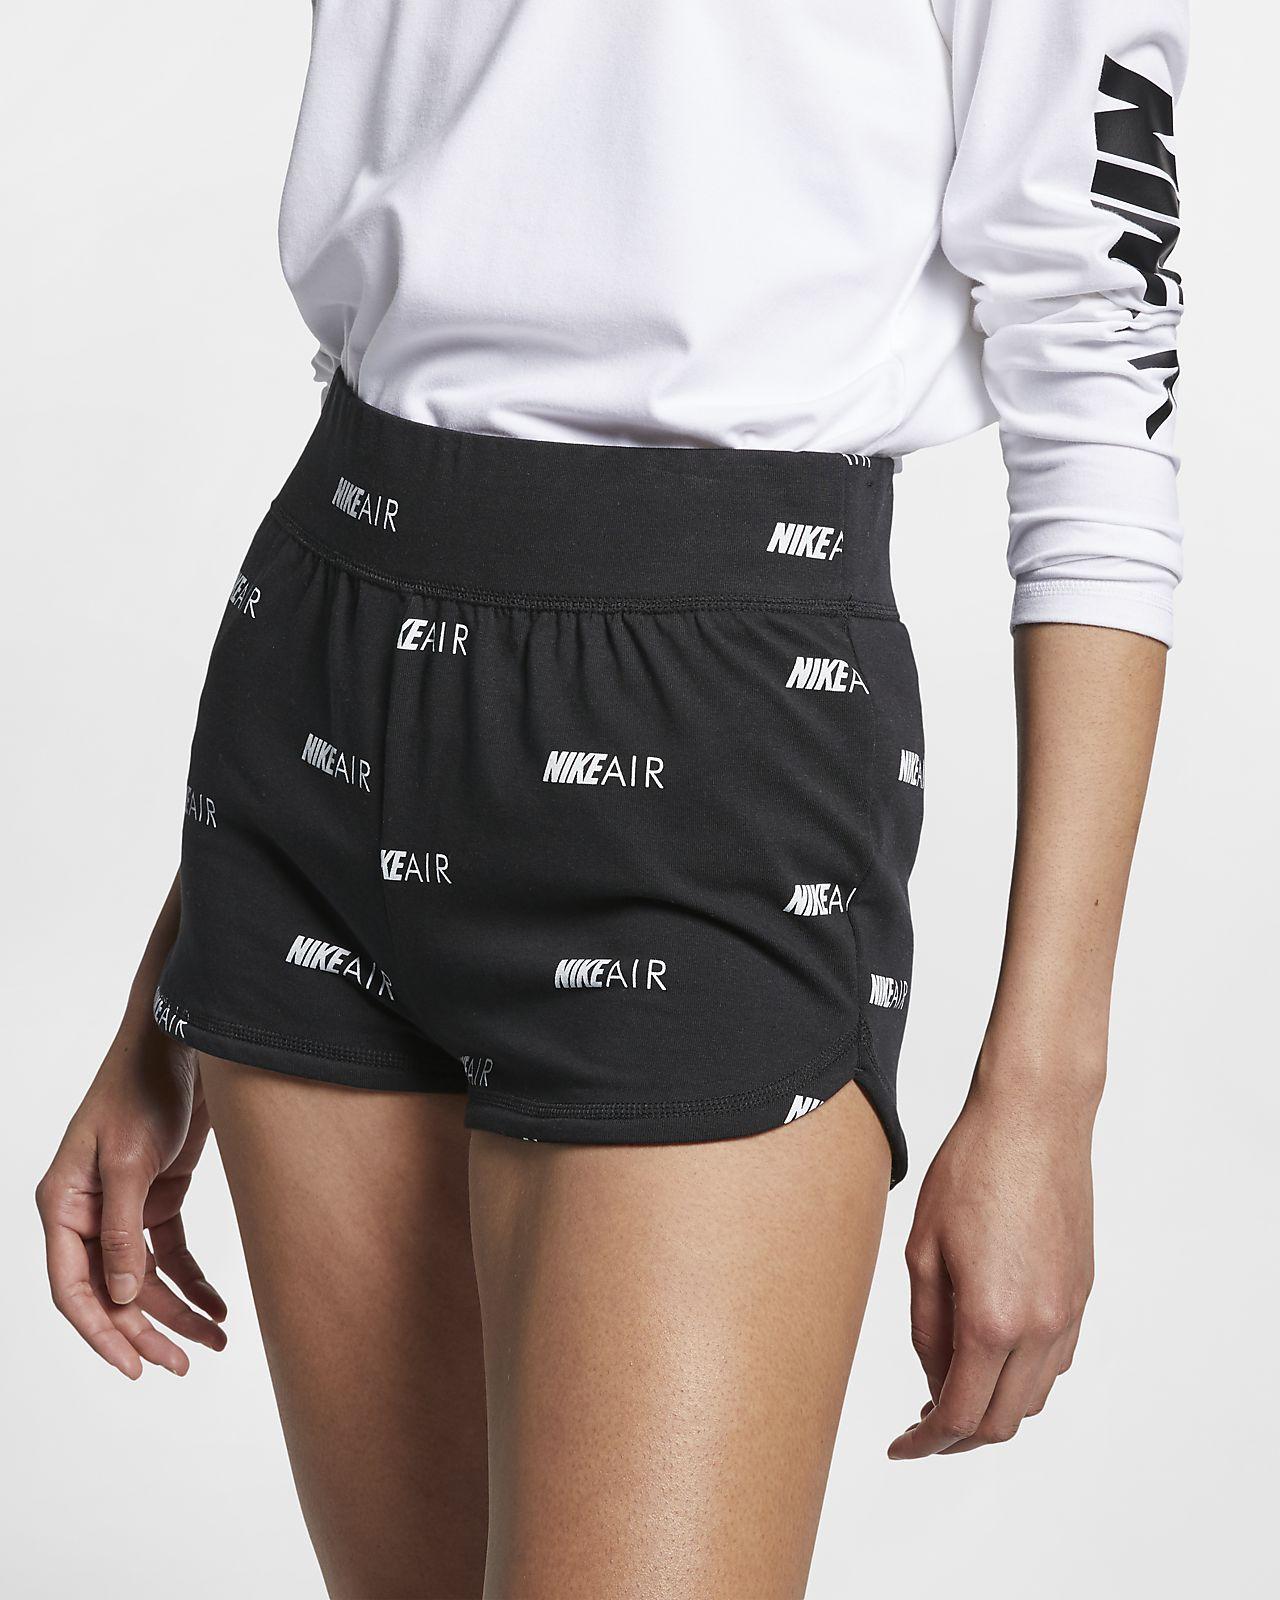 Nike Air Damenshorts mit Print